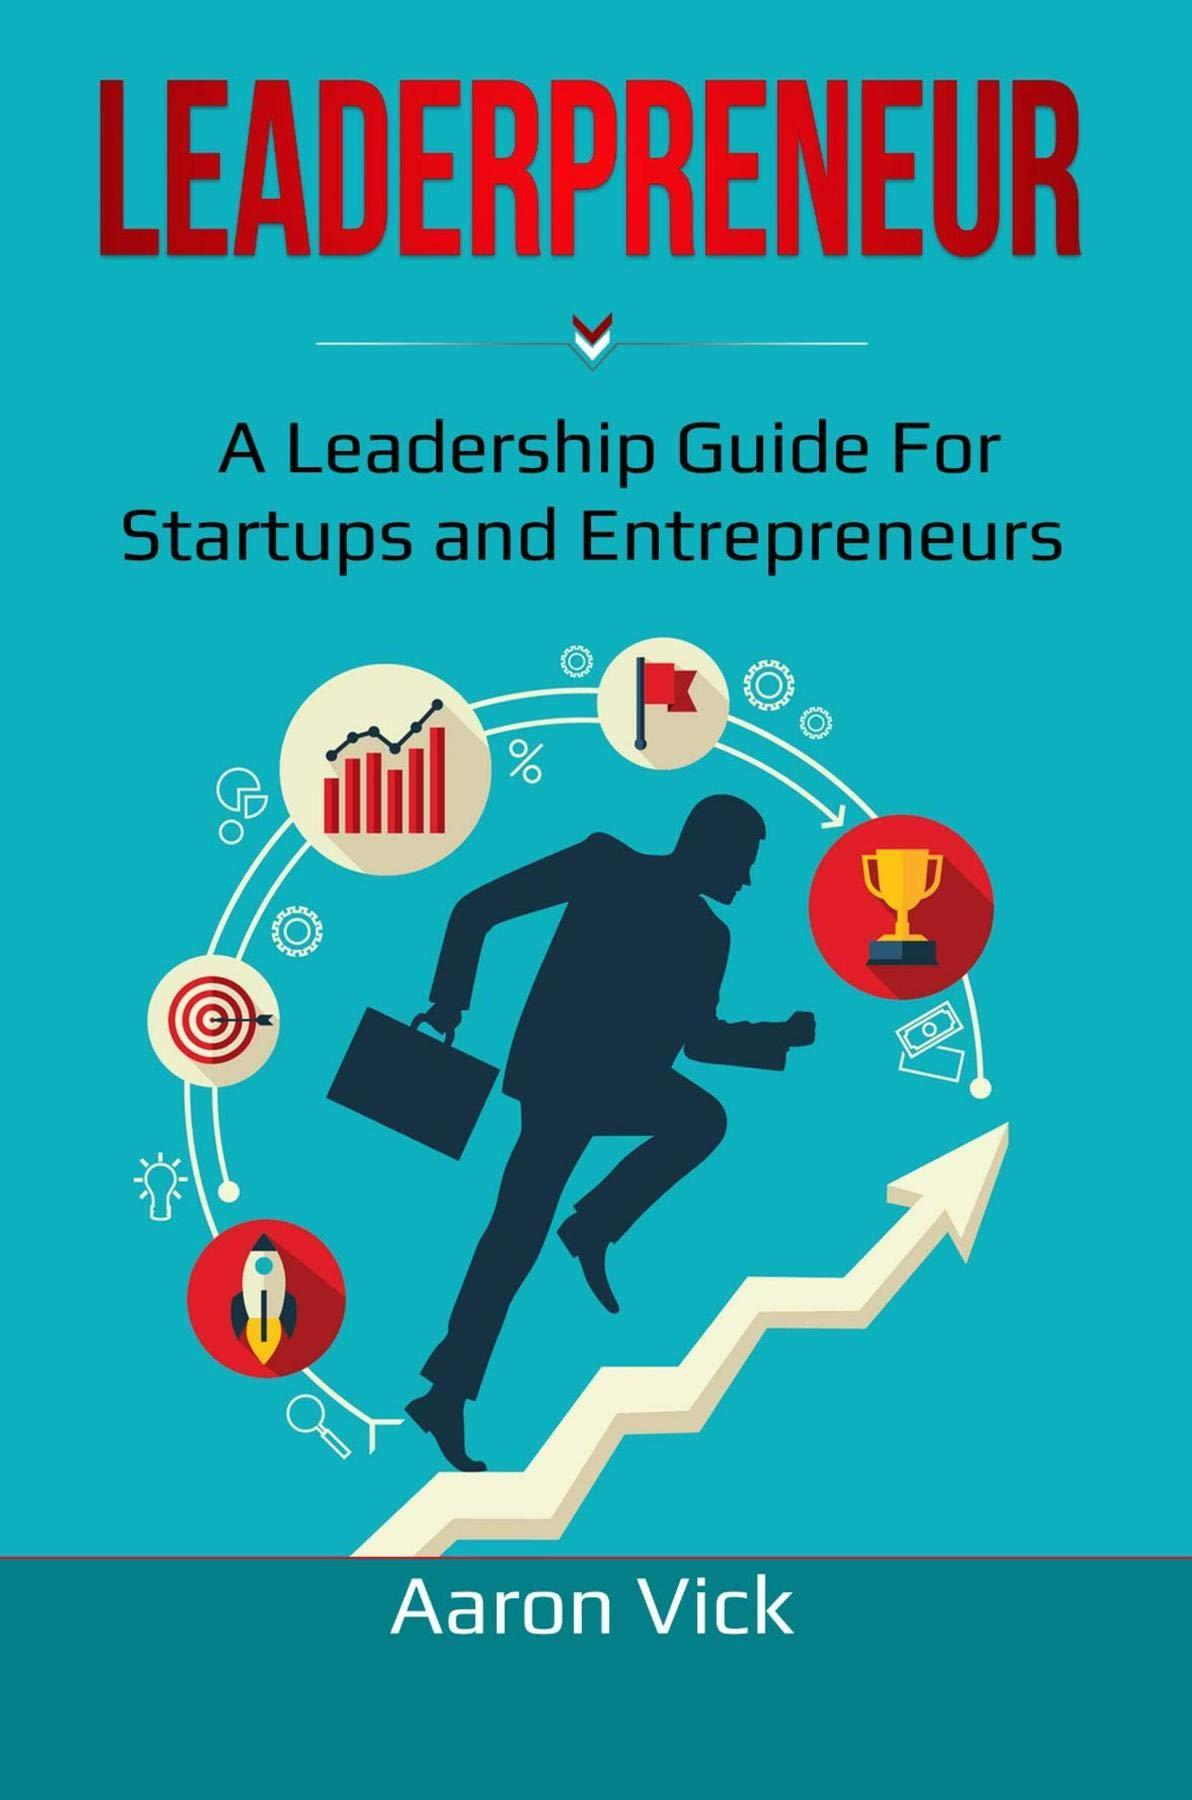 Leaderpreneur